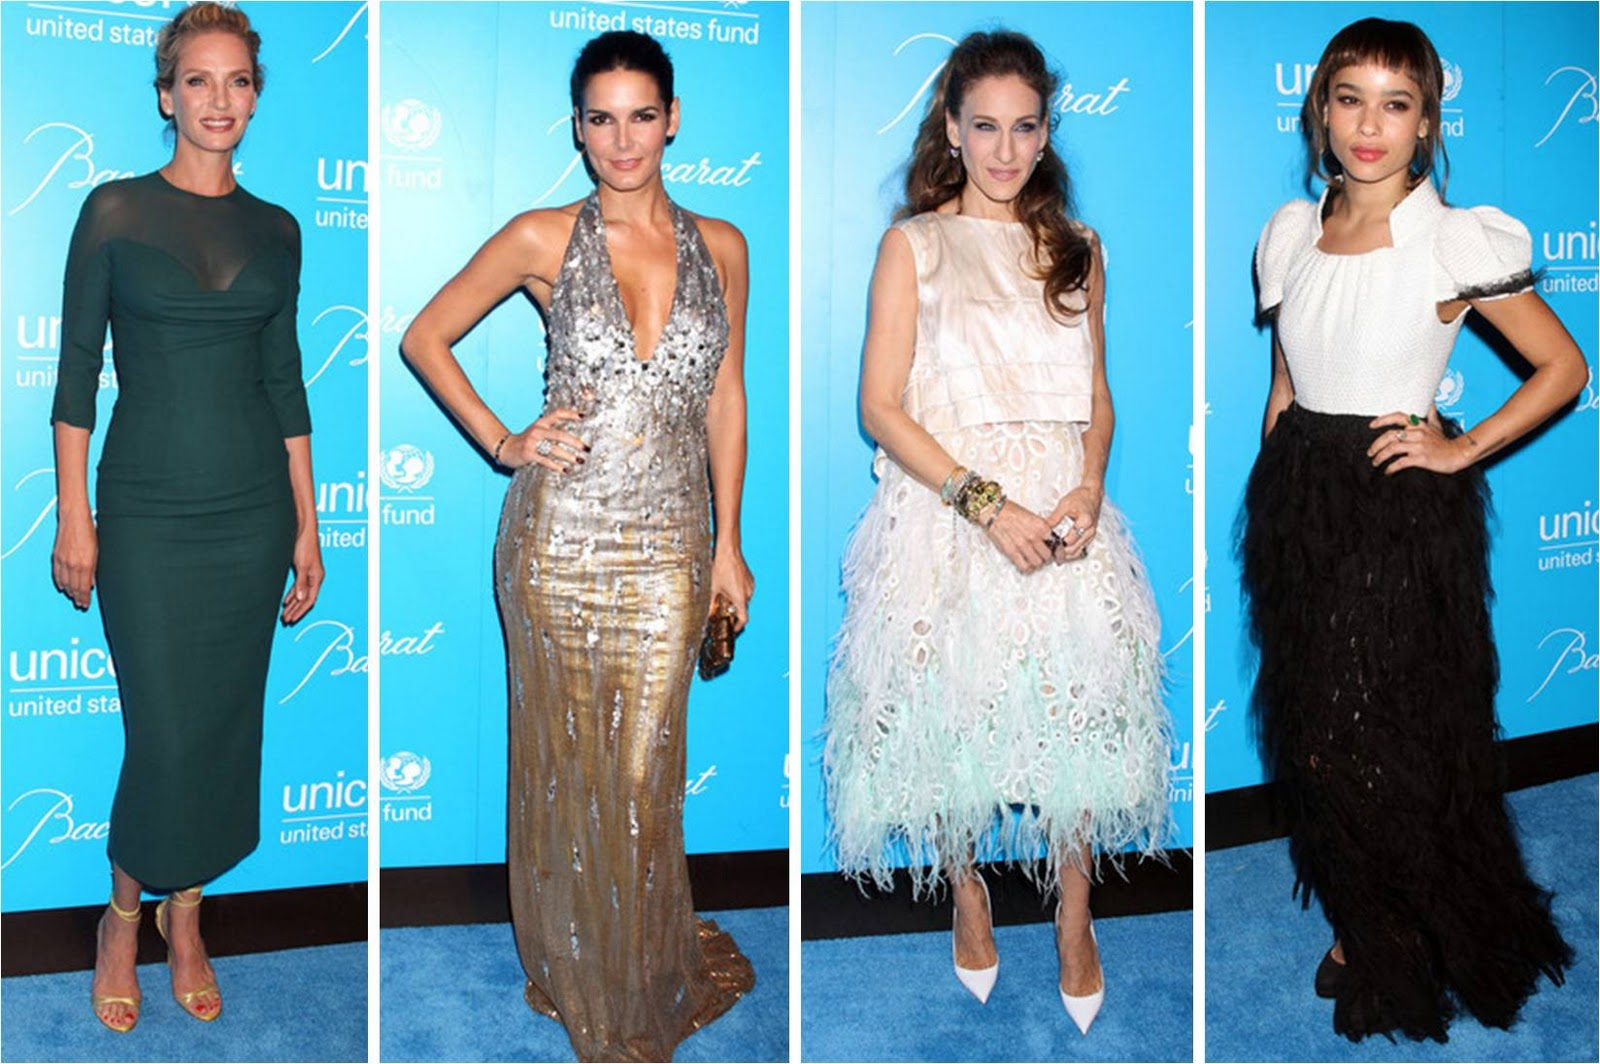 http://1.bp.blogspot.com/-E0t--iKAeq4/TthpibADF1I/AAAAAAAAIEY/7ZOEy7cENf4/s1600/UNICEF+Snowflake+Ball+Best+Dressed+Uma+Thurman+Angie+Harman+Sarah+Jessica+Parker+Zoe+Kravitz.jpg